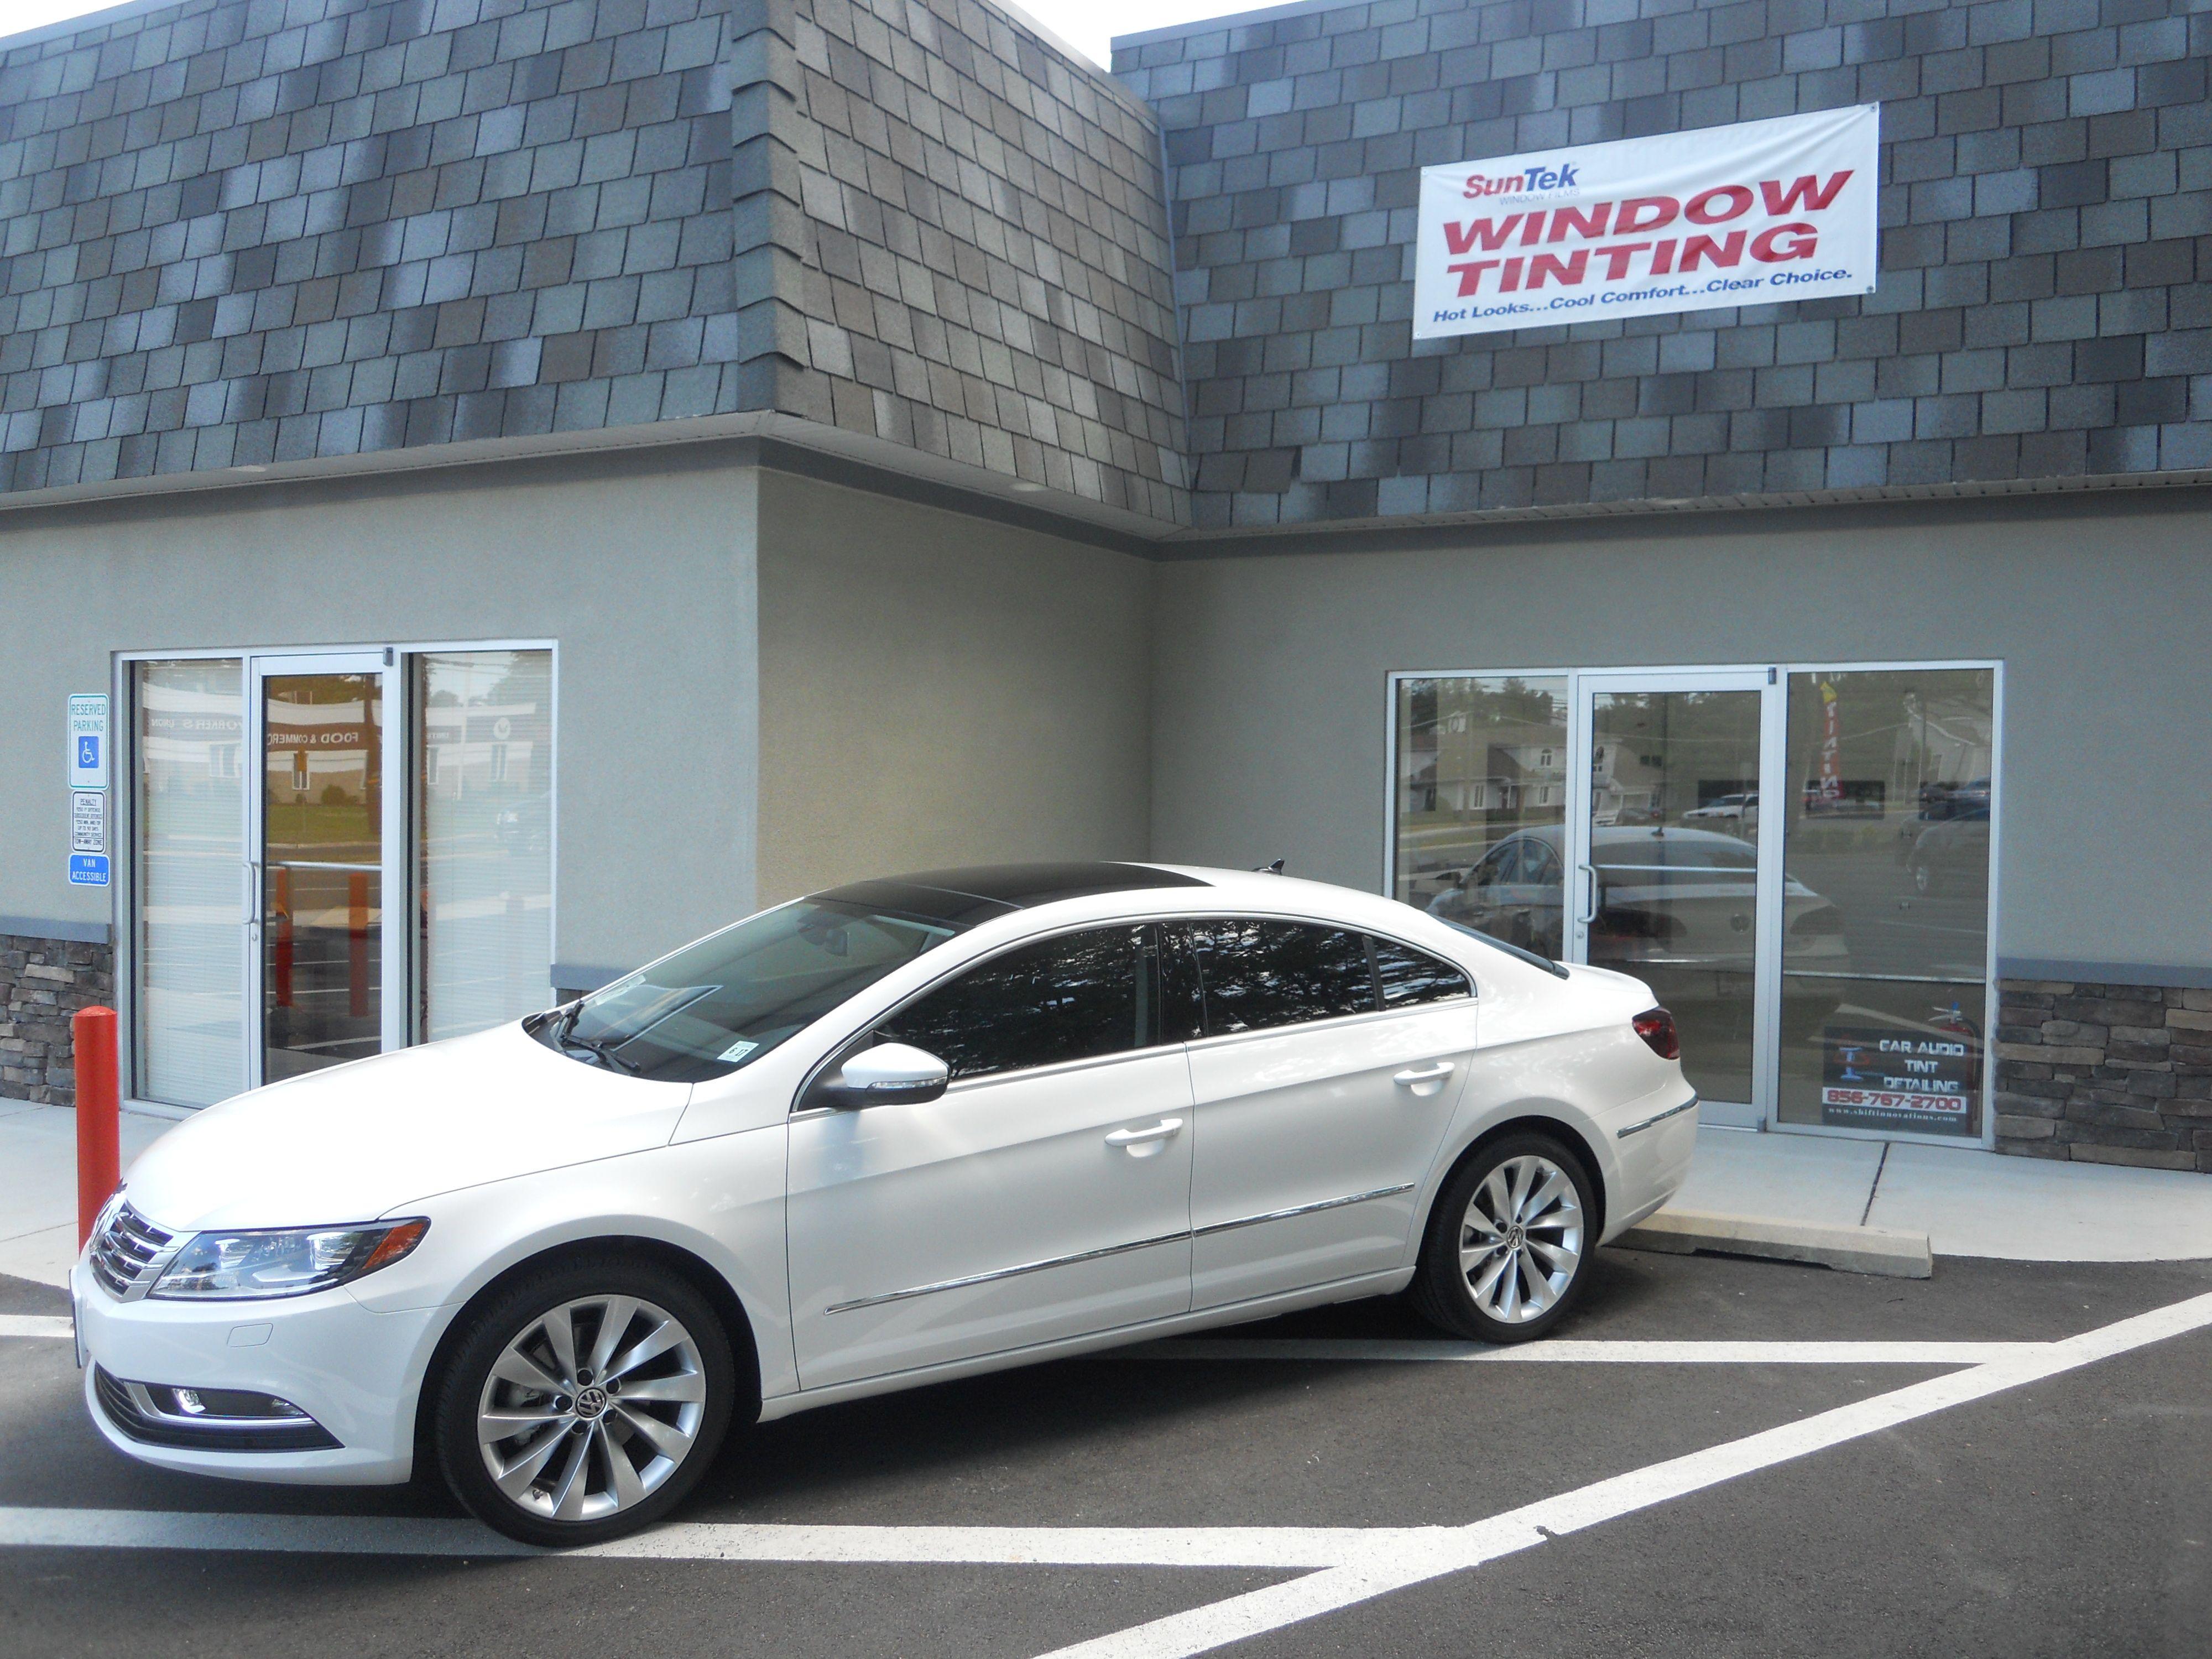 Simi Valley Honda >> 2012 VW CC- SunTek Carbon 35% Full Car   Window Tinting   Pinterest   Vw cc, Vw and Cars